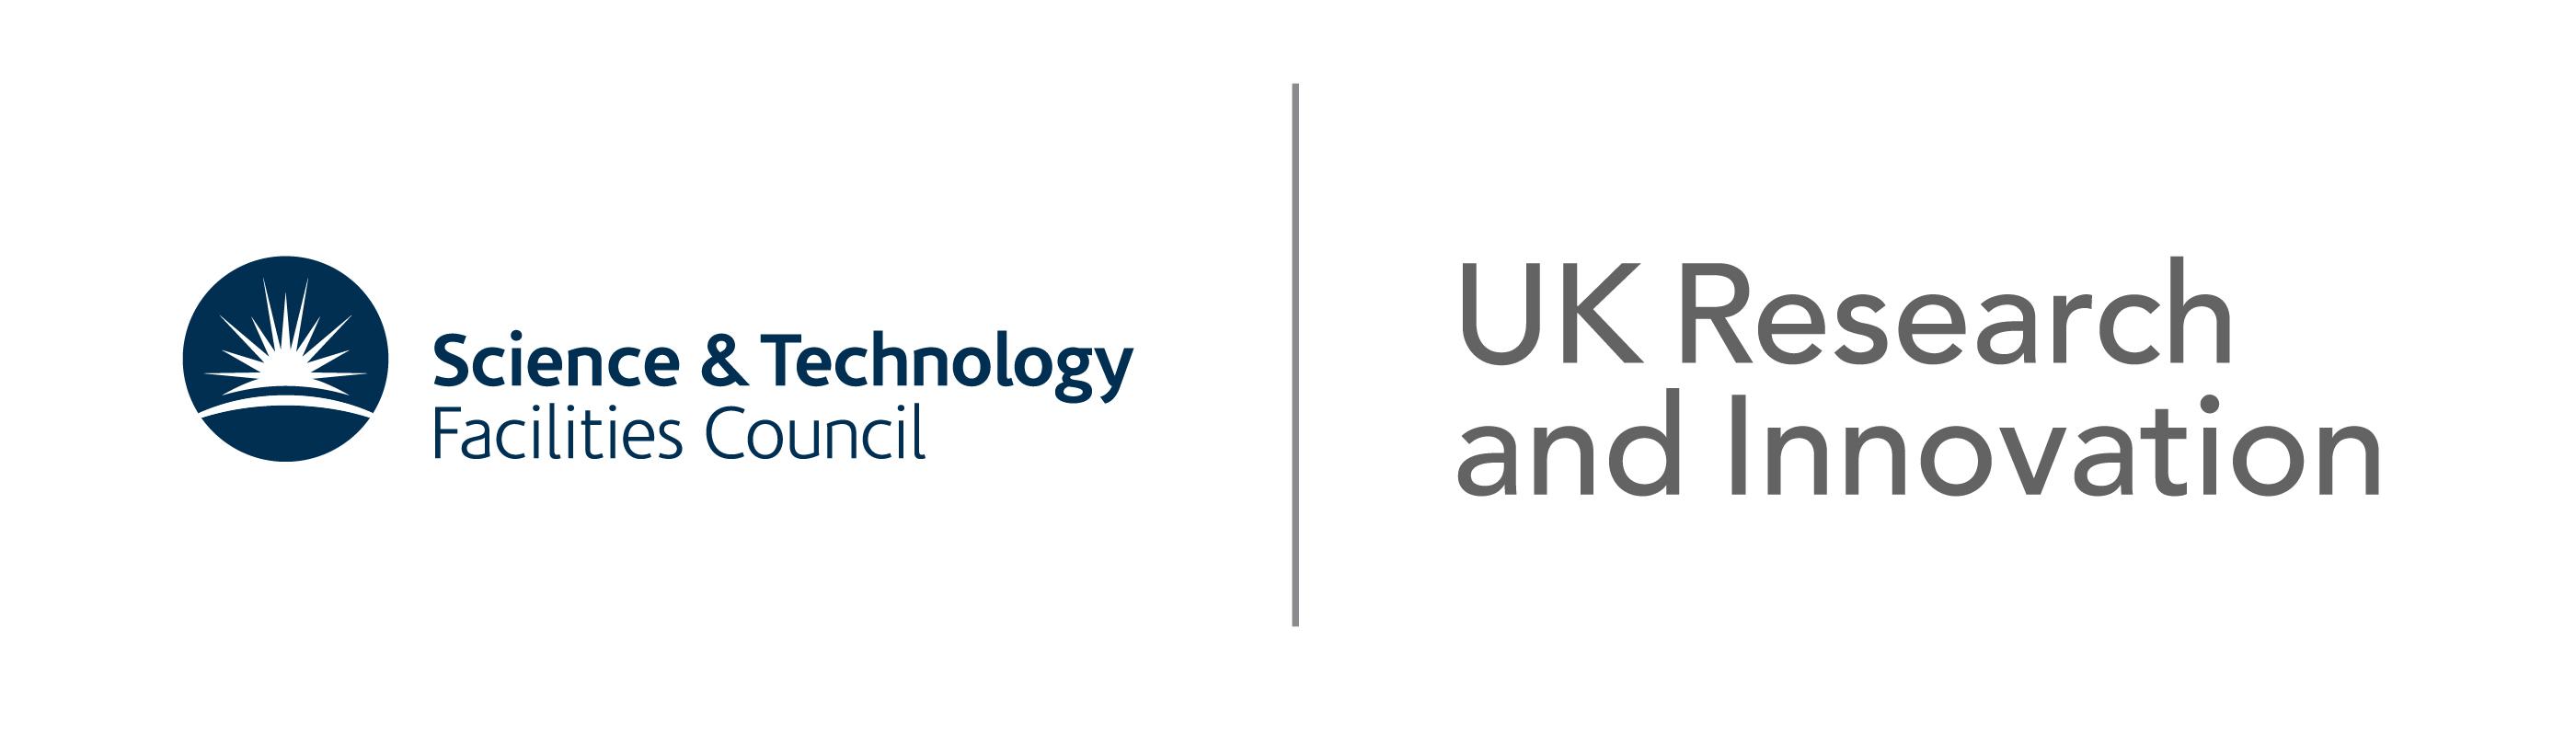 UKRI Science and Technology Facilities Council (UKRI STFC)